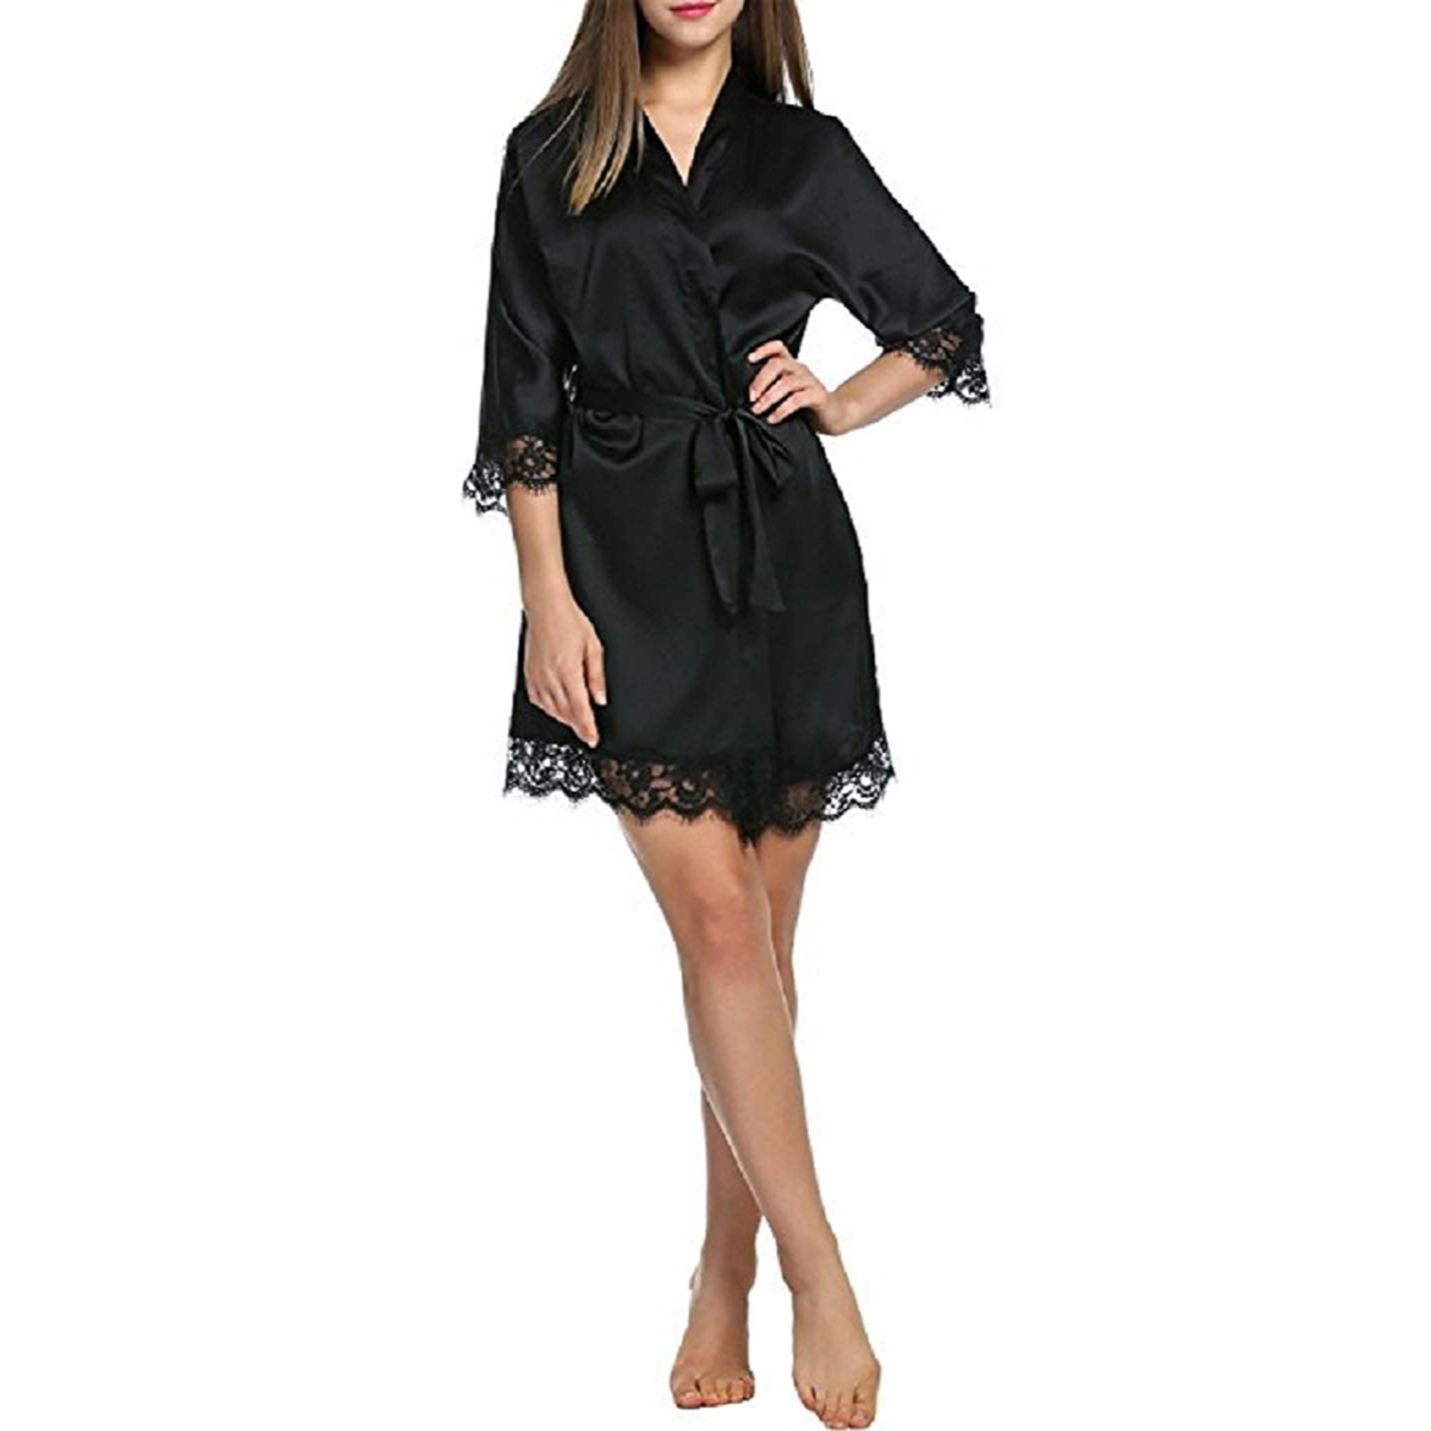 Buy ELEVANTO Women's Satin Mid Thigh Length Night Robe (Sole83, Black) at Amazon.in